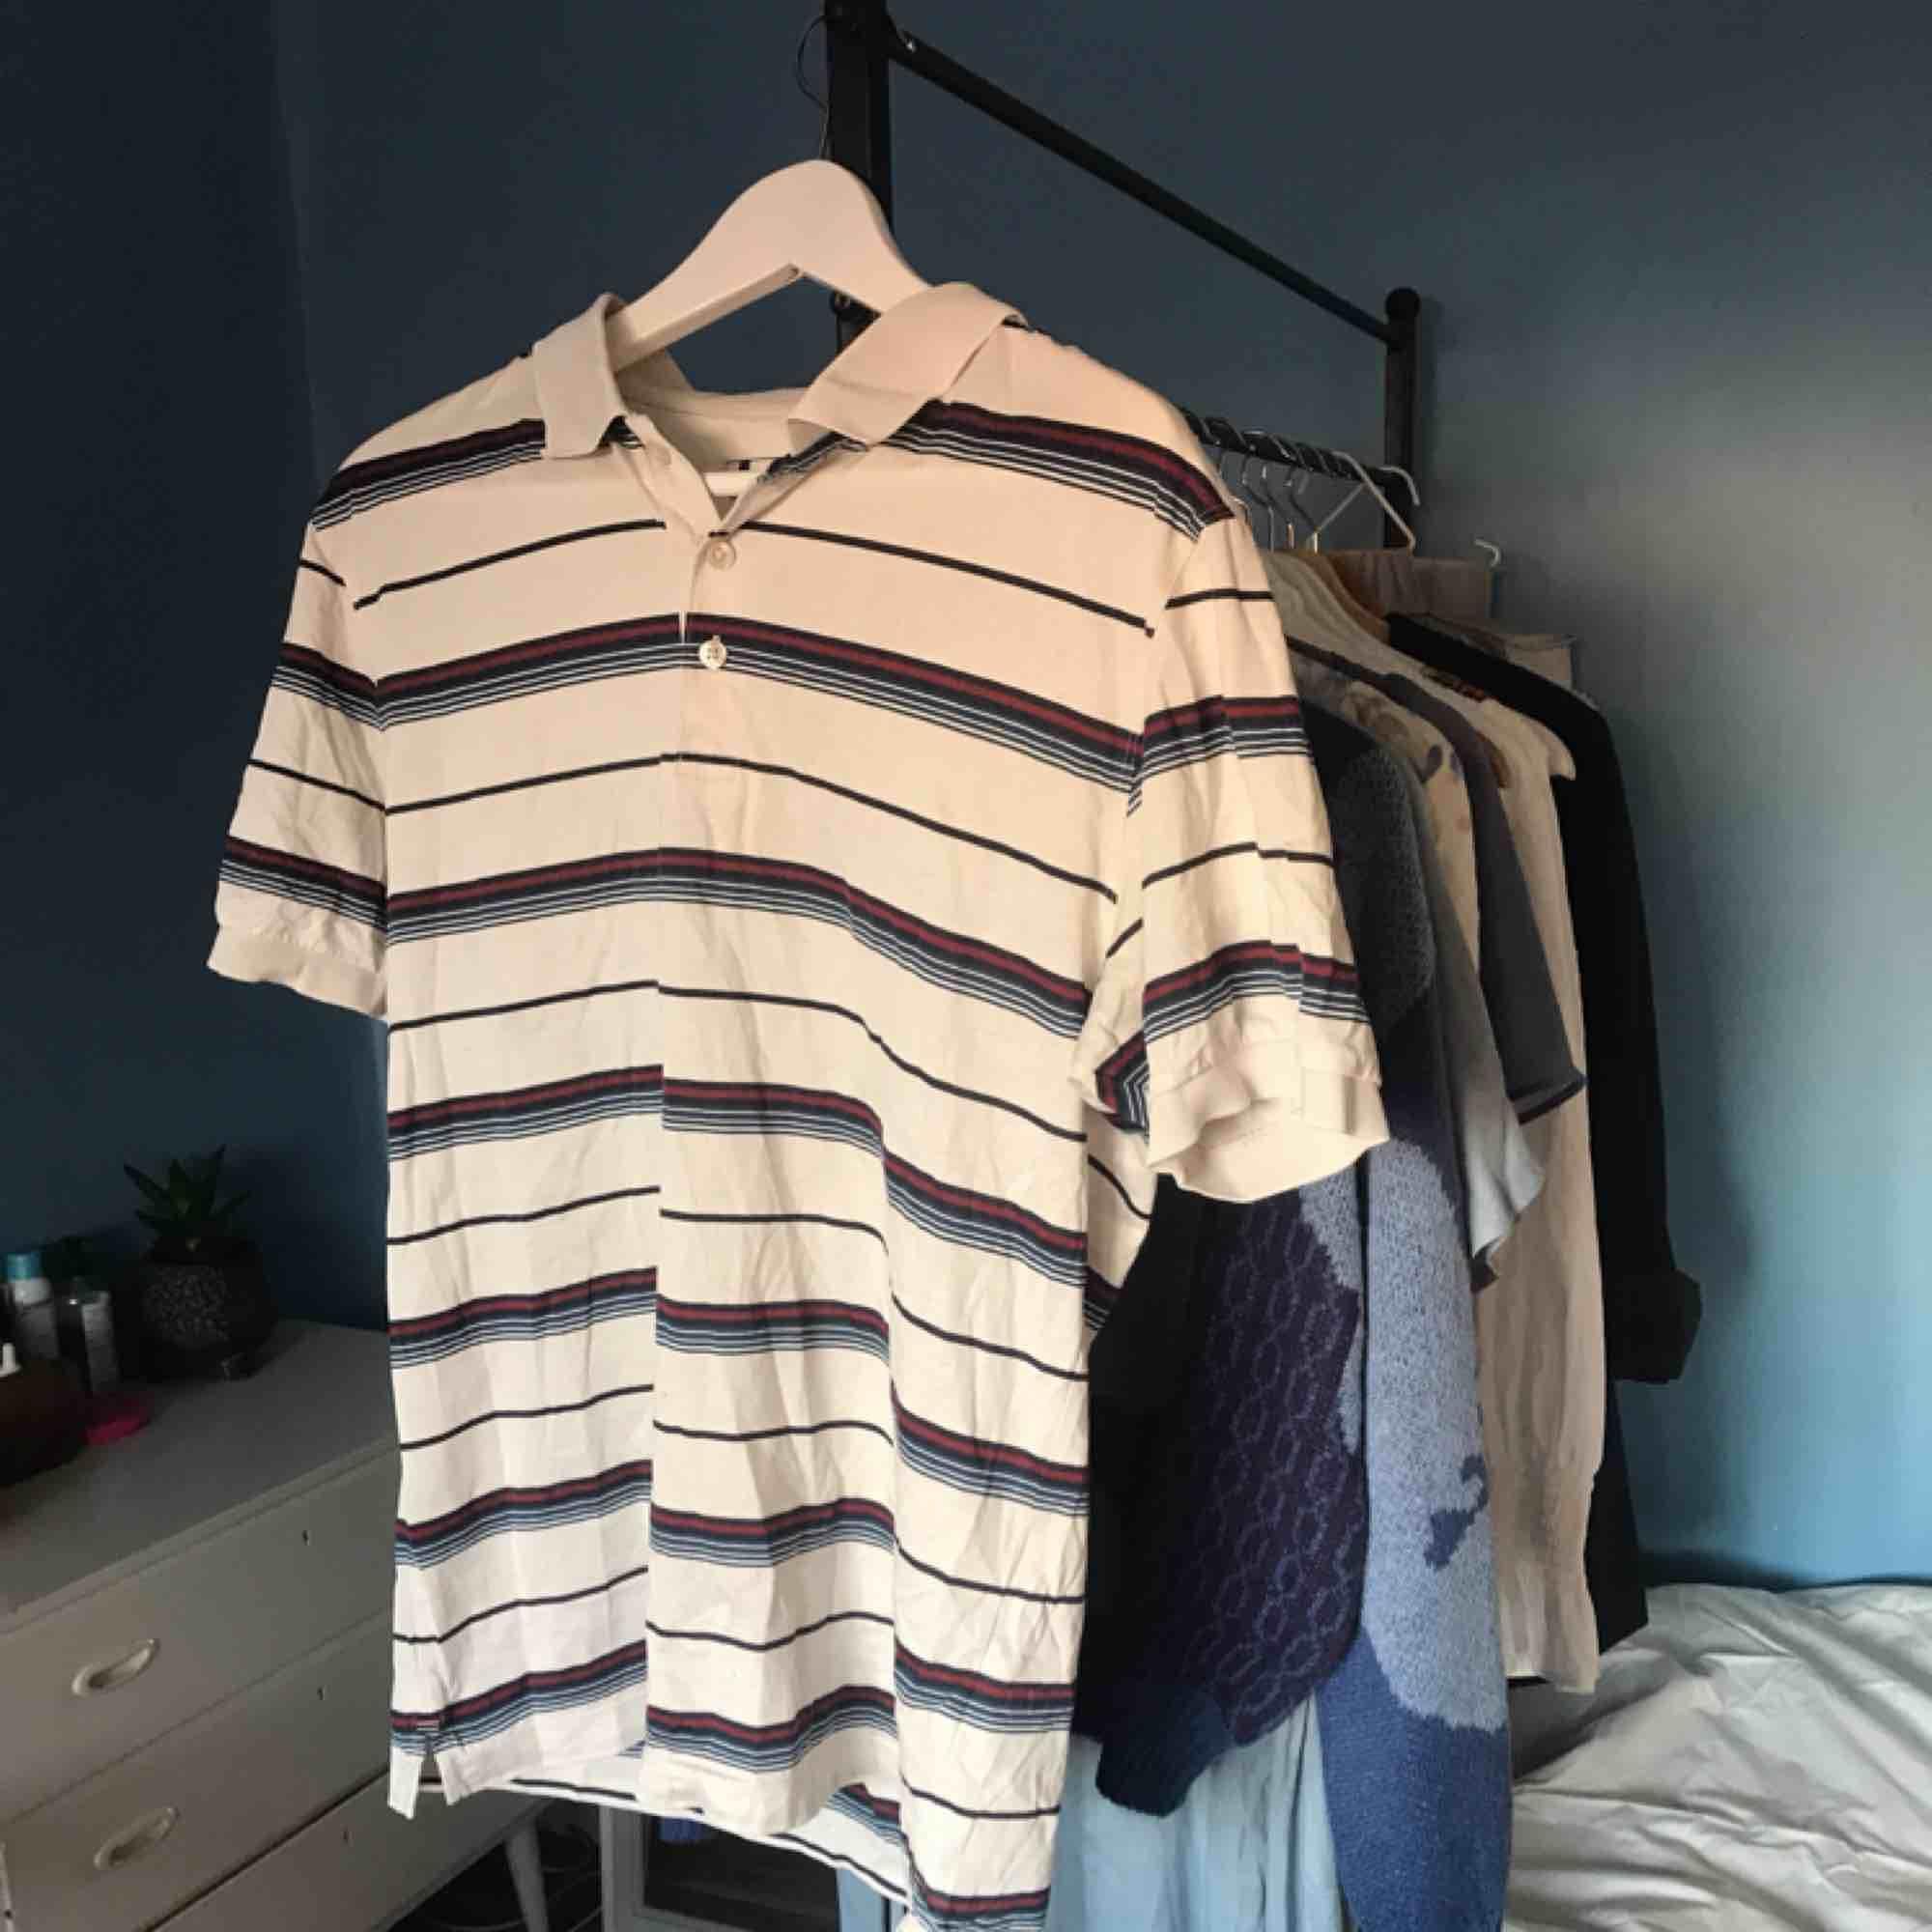 Oversized polo tröja ifrån dressman🥀. Skjortor.